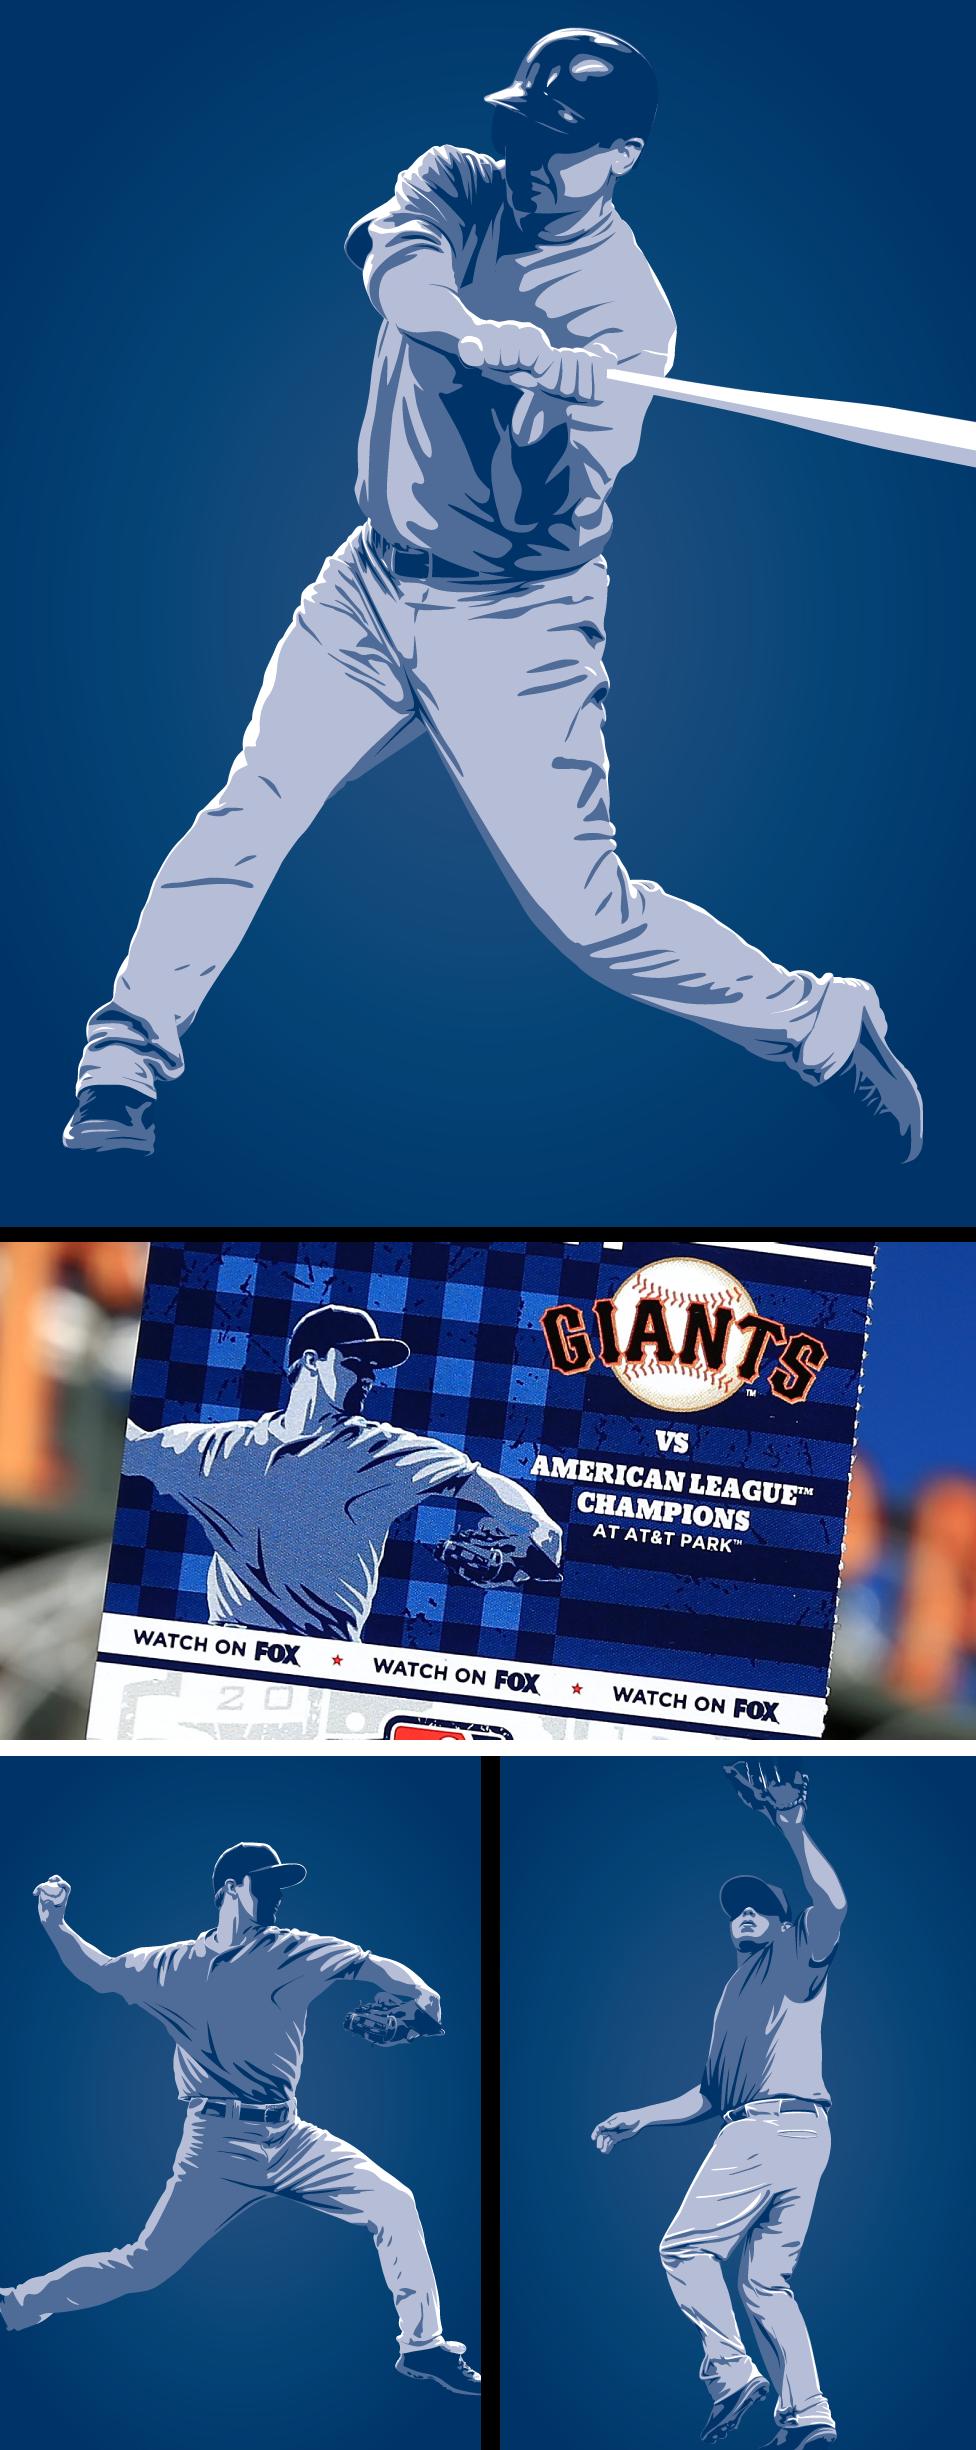 2012 World Series Player Art